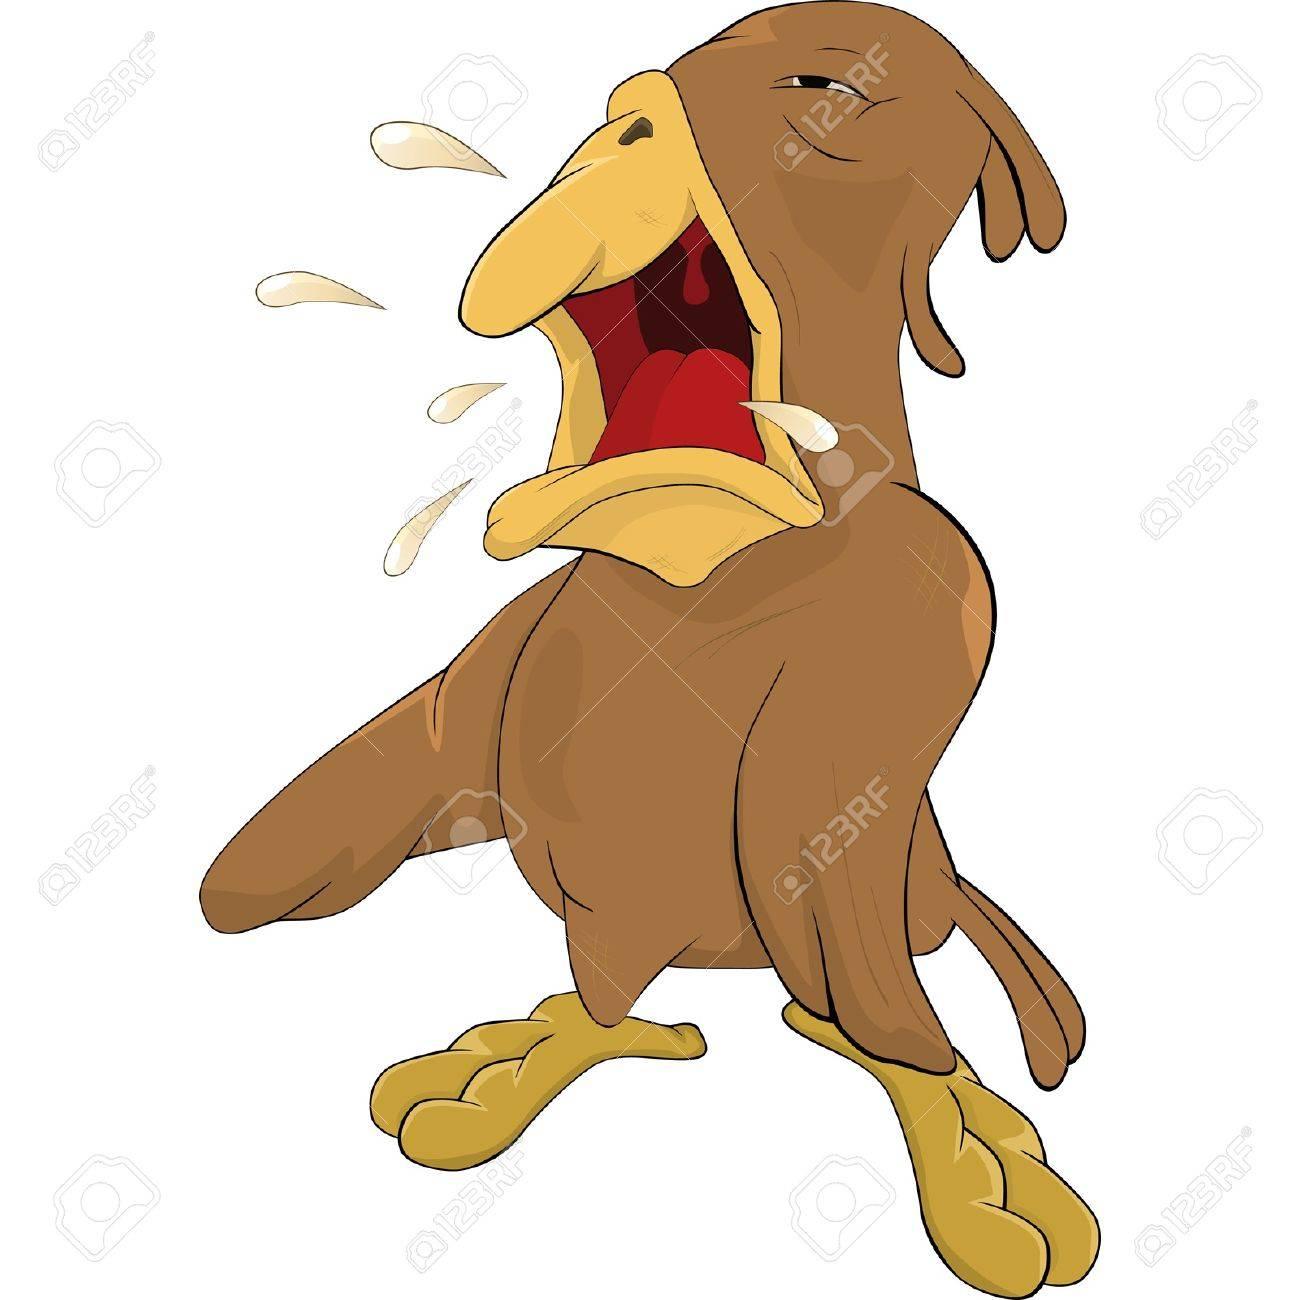 The sparrow cries Stock Vector - 12483923